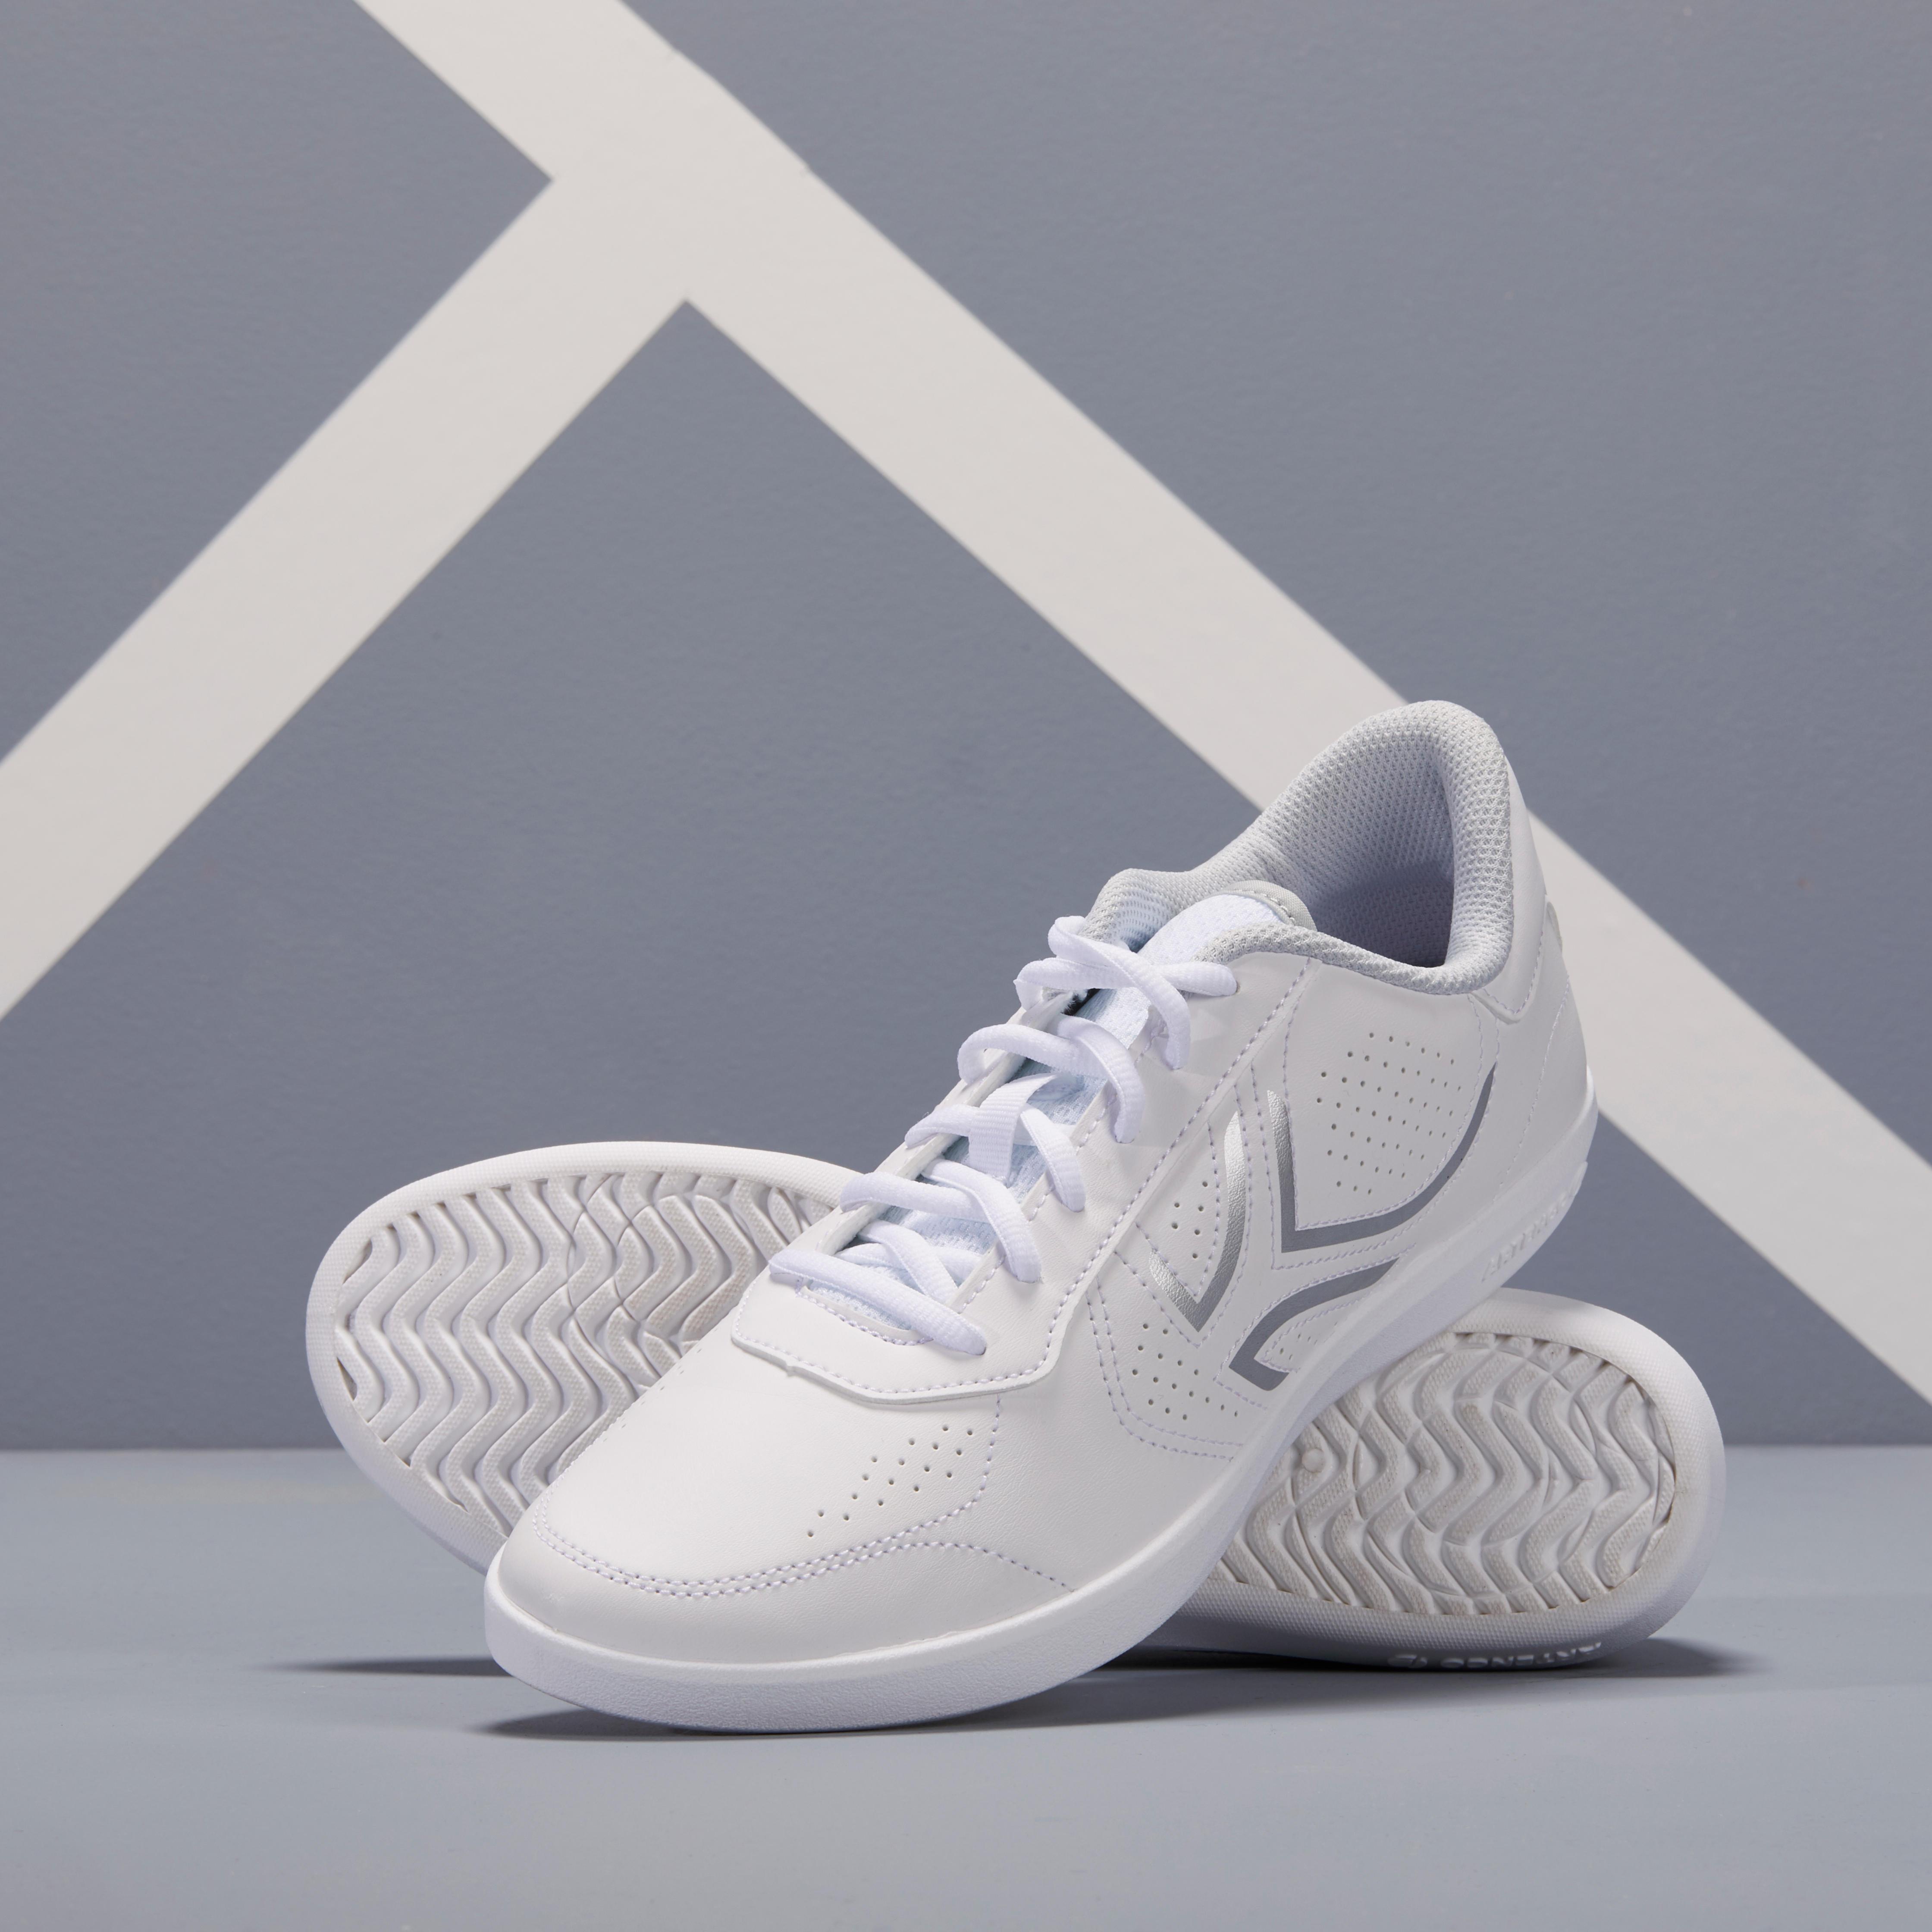 TS100 Women's Tennis Shoes - White